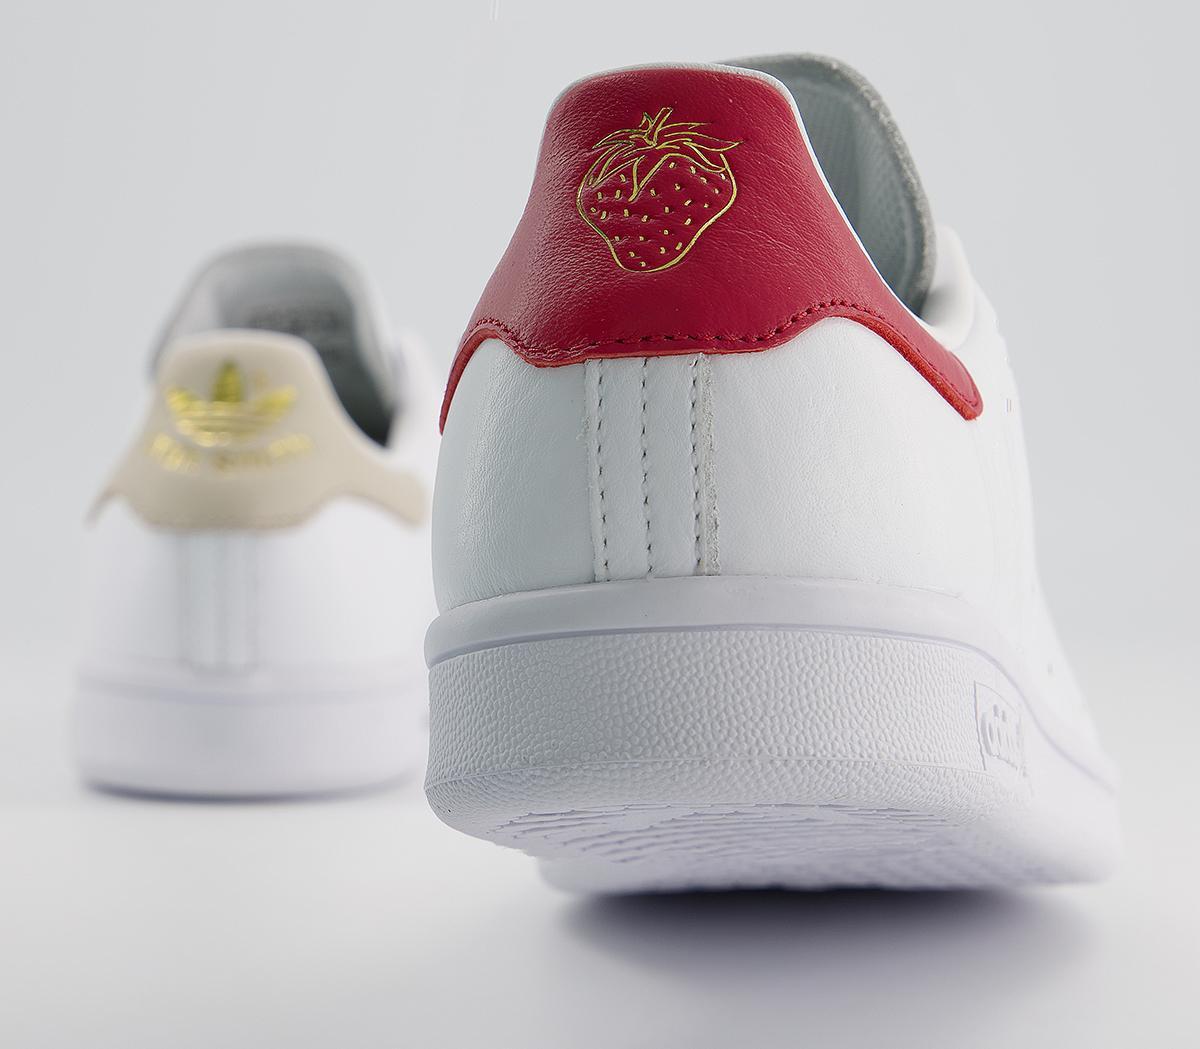 Analítico Regaño unir  adidas Stan Smith Trainers White Strawberries And Cream Exclusive - Unisex  Sports